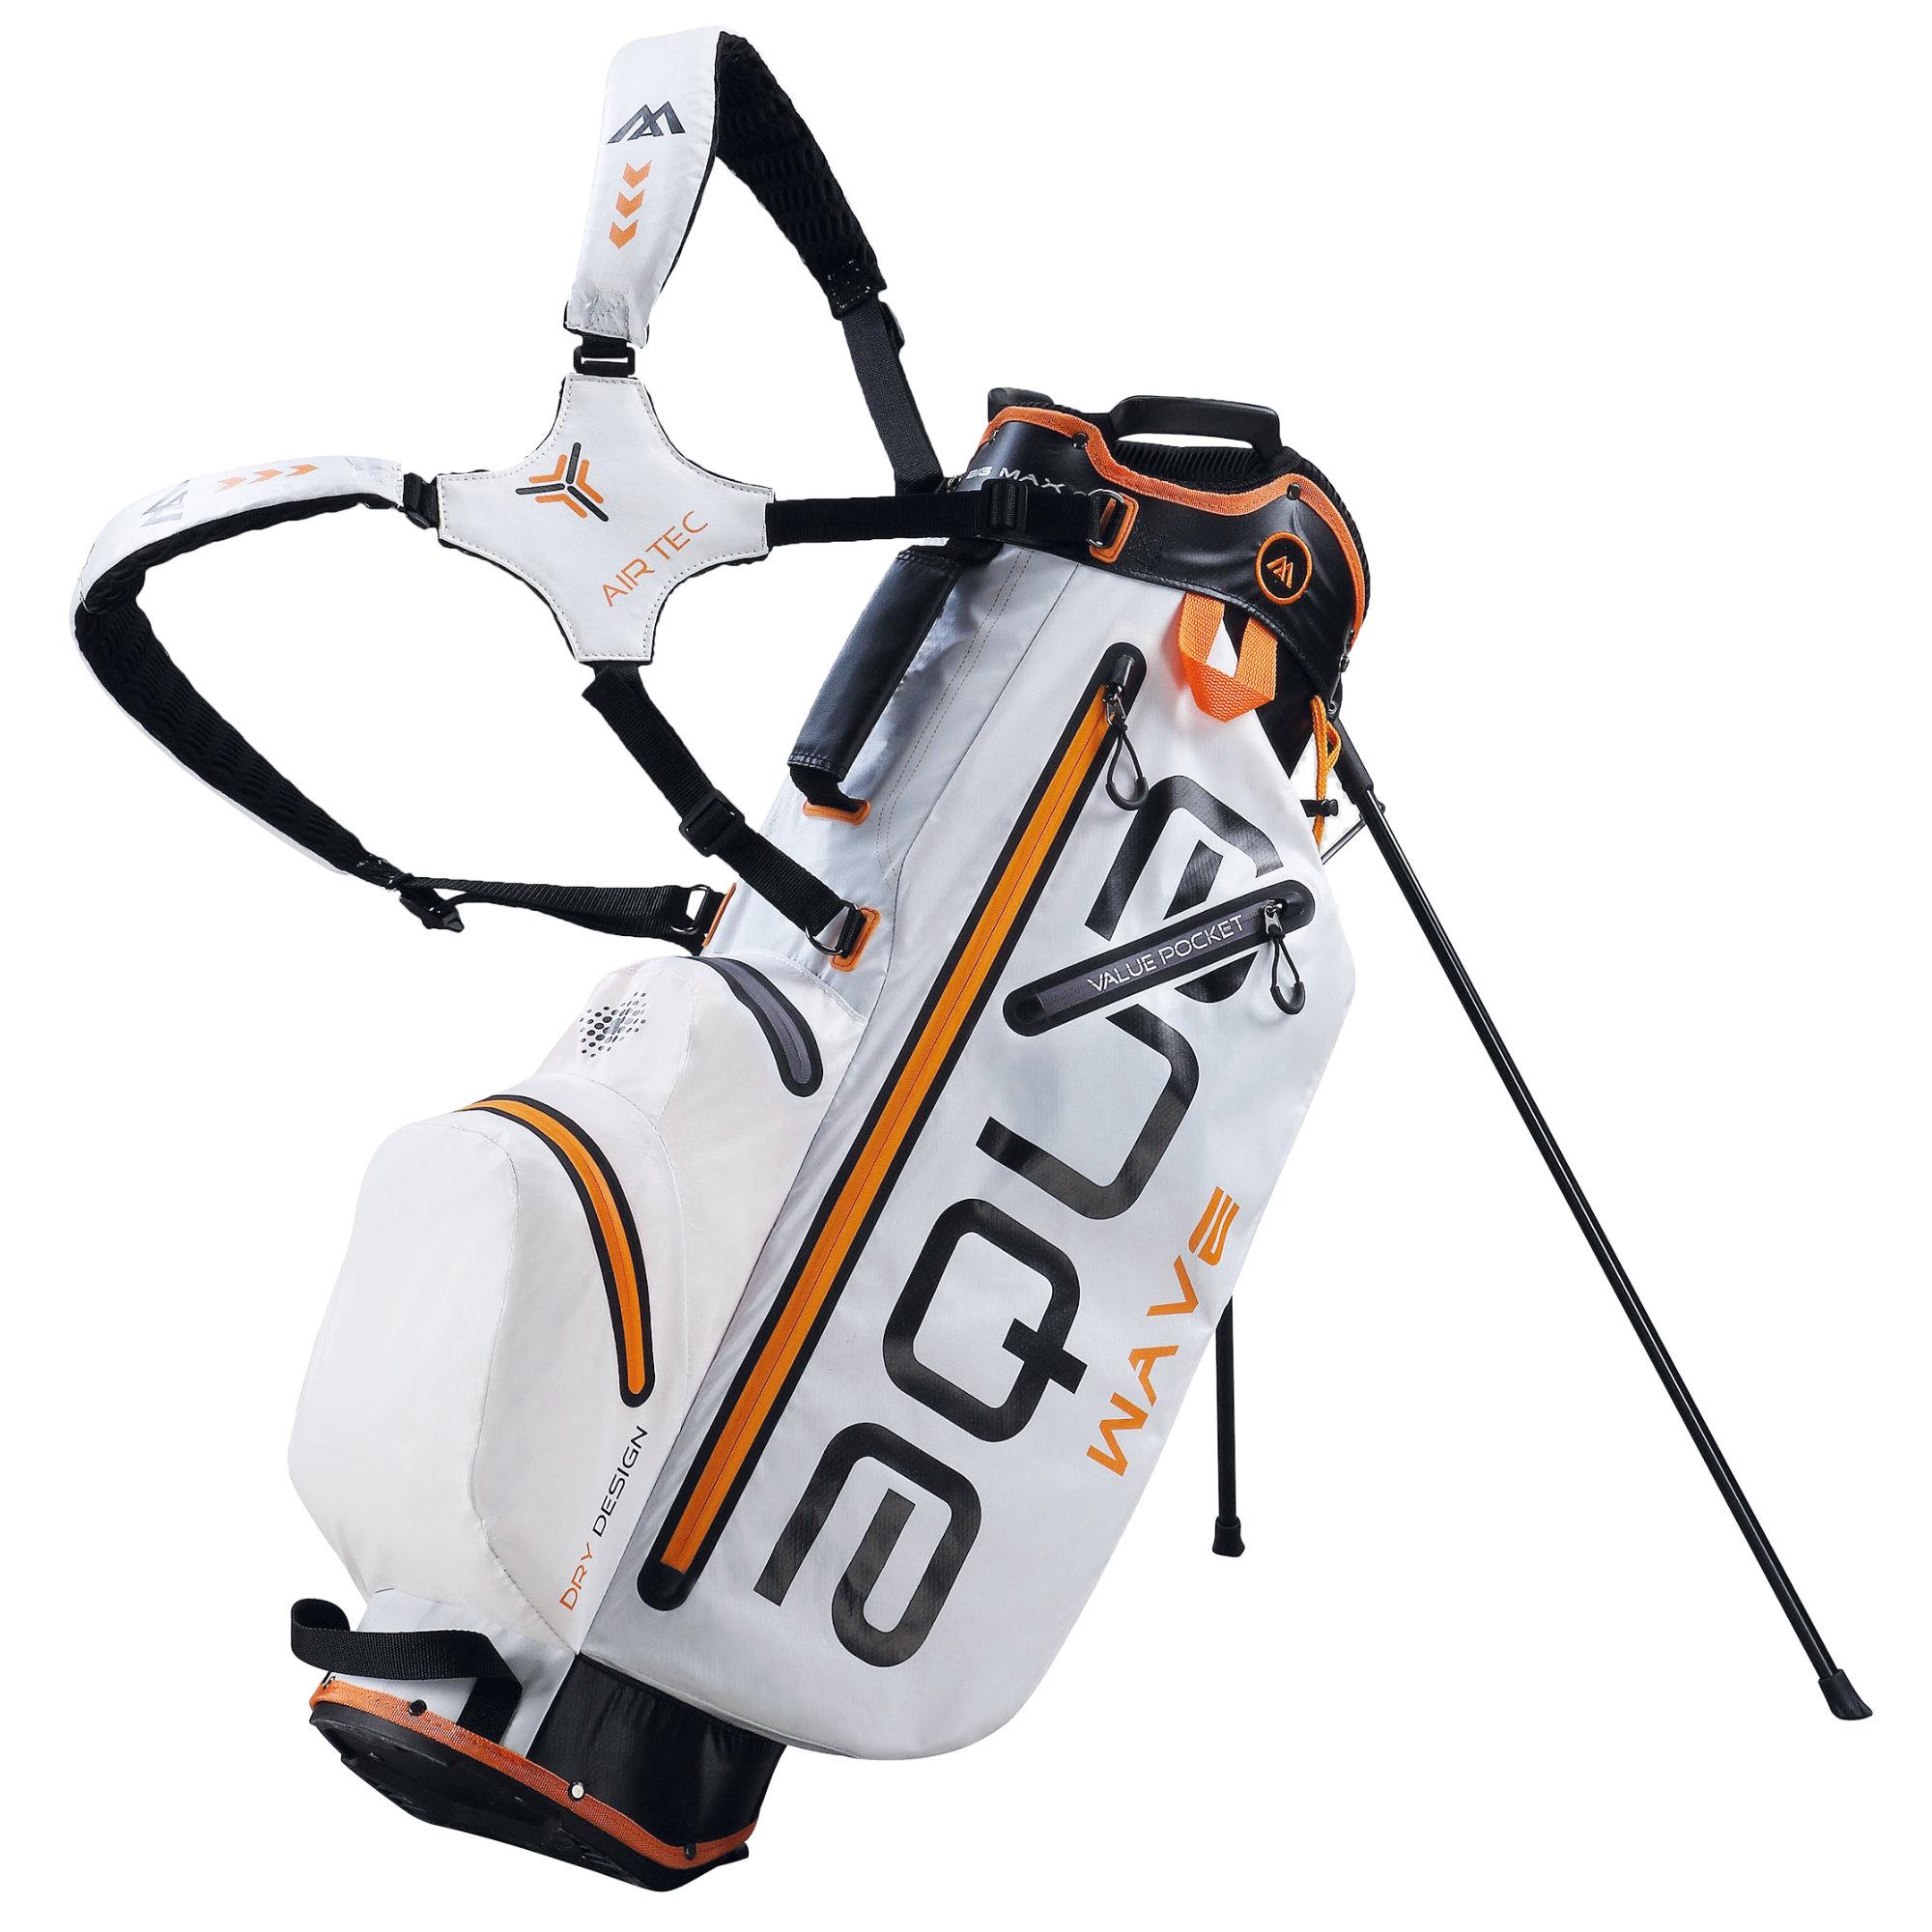 Big Max Aqua Wave Golf Stand Bag - White